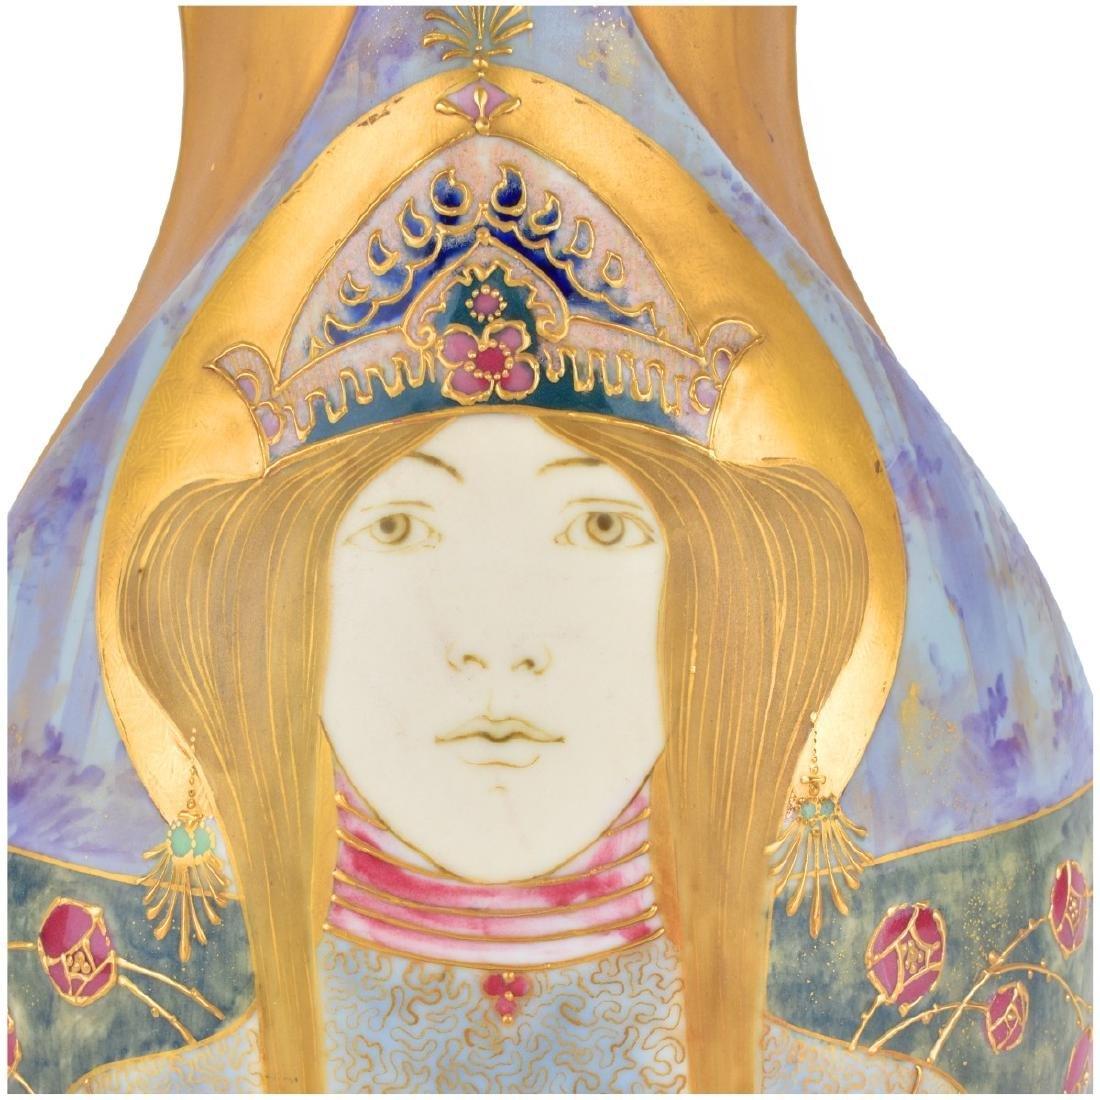 Amphora Turn Teplitz Princess Vase - 5